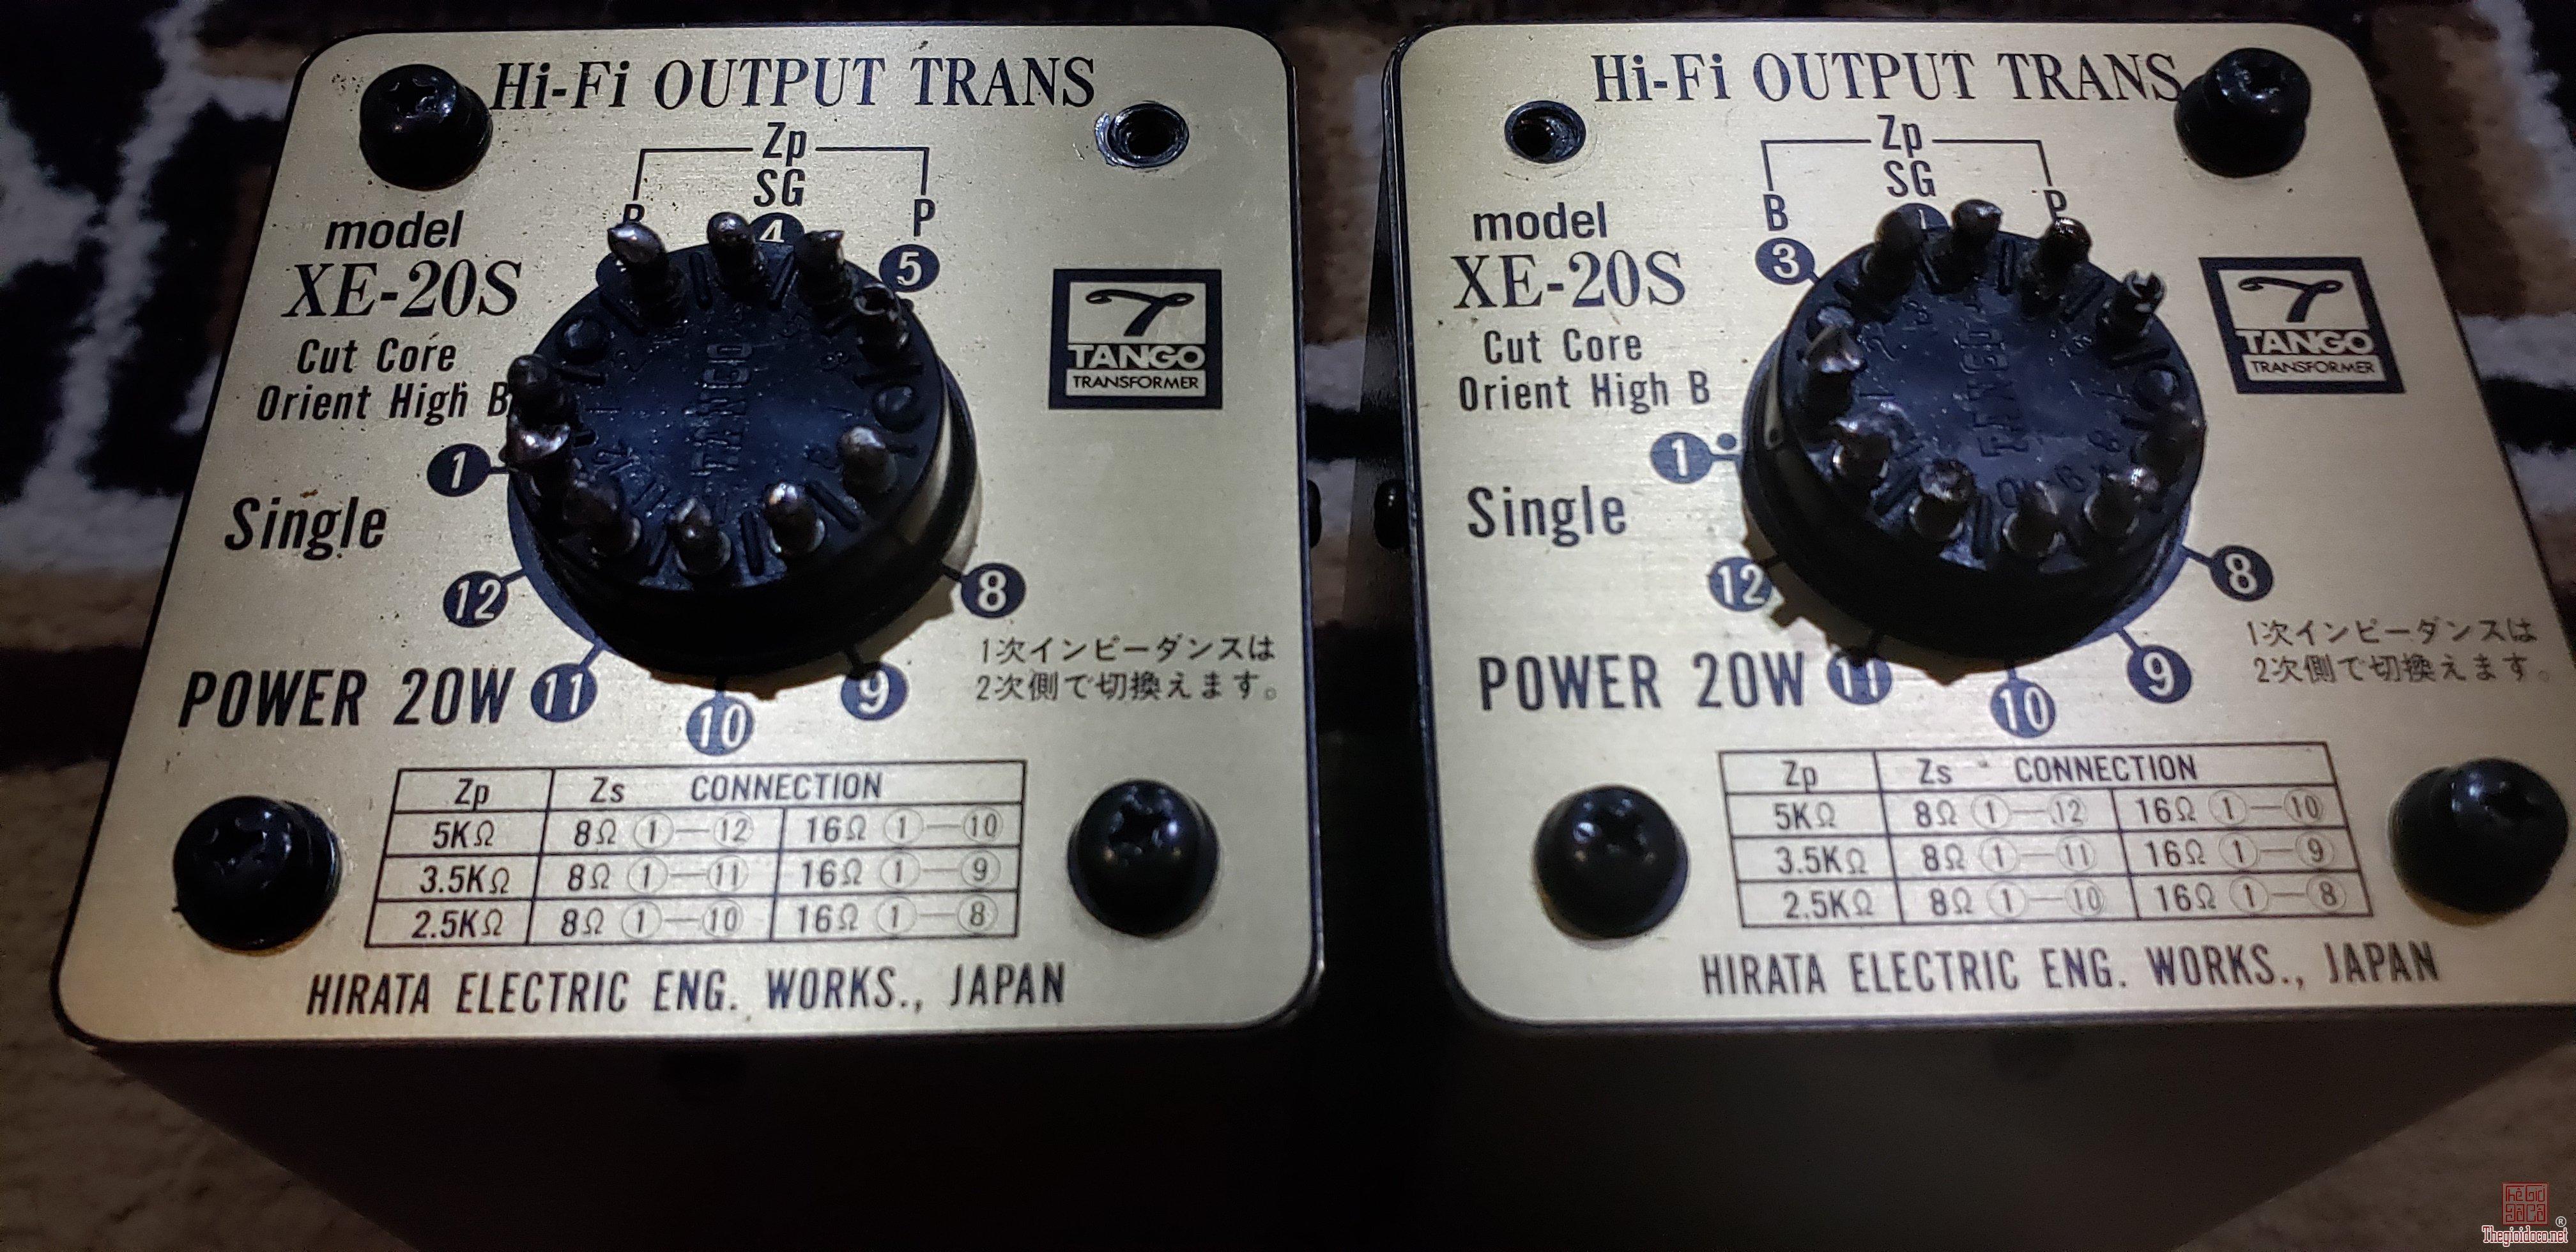 Tango OPT XE-20S